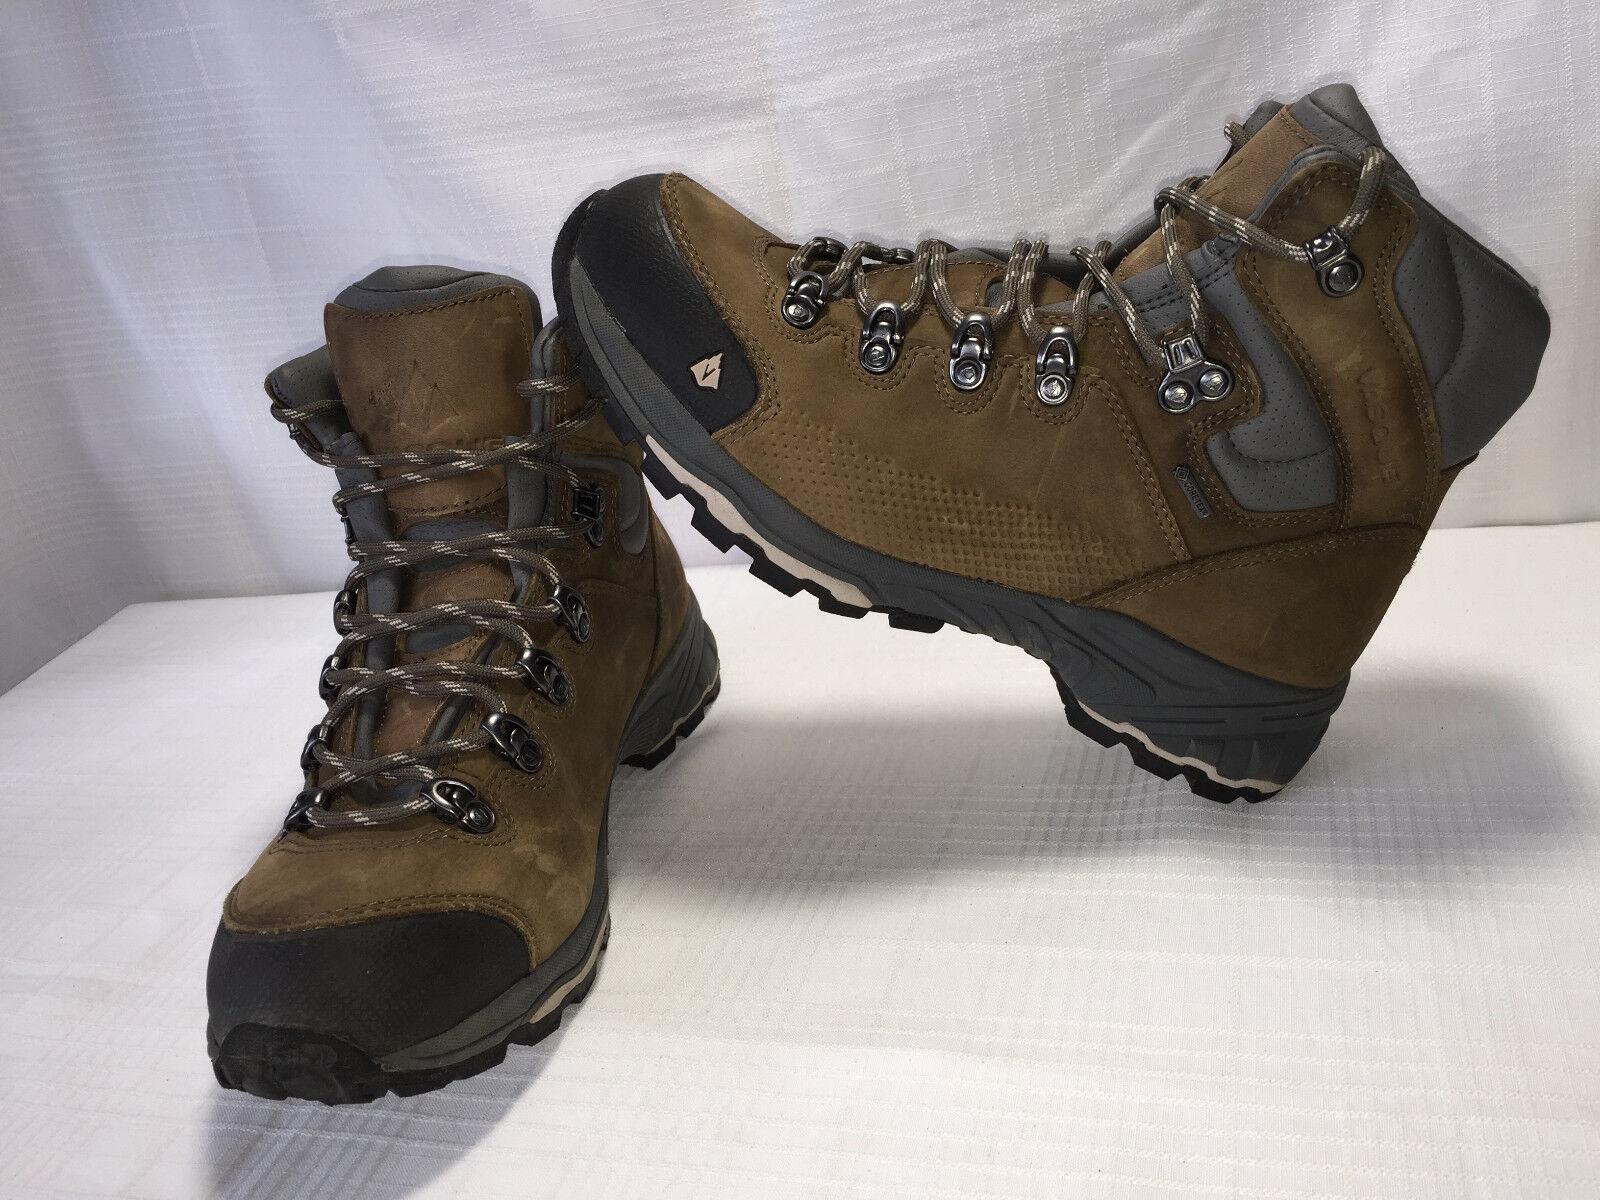 VASQUE ST ELIAS GTX  Hiking Boots Women Size 9.5M Brown Leather Retail  250  shop online today